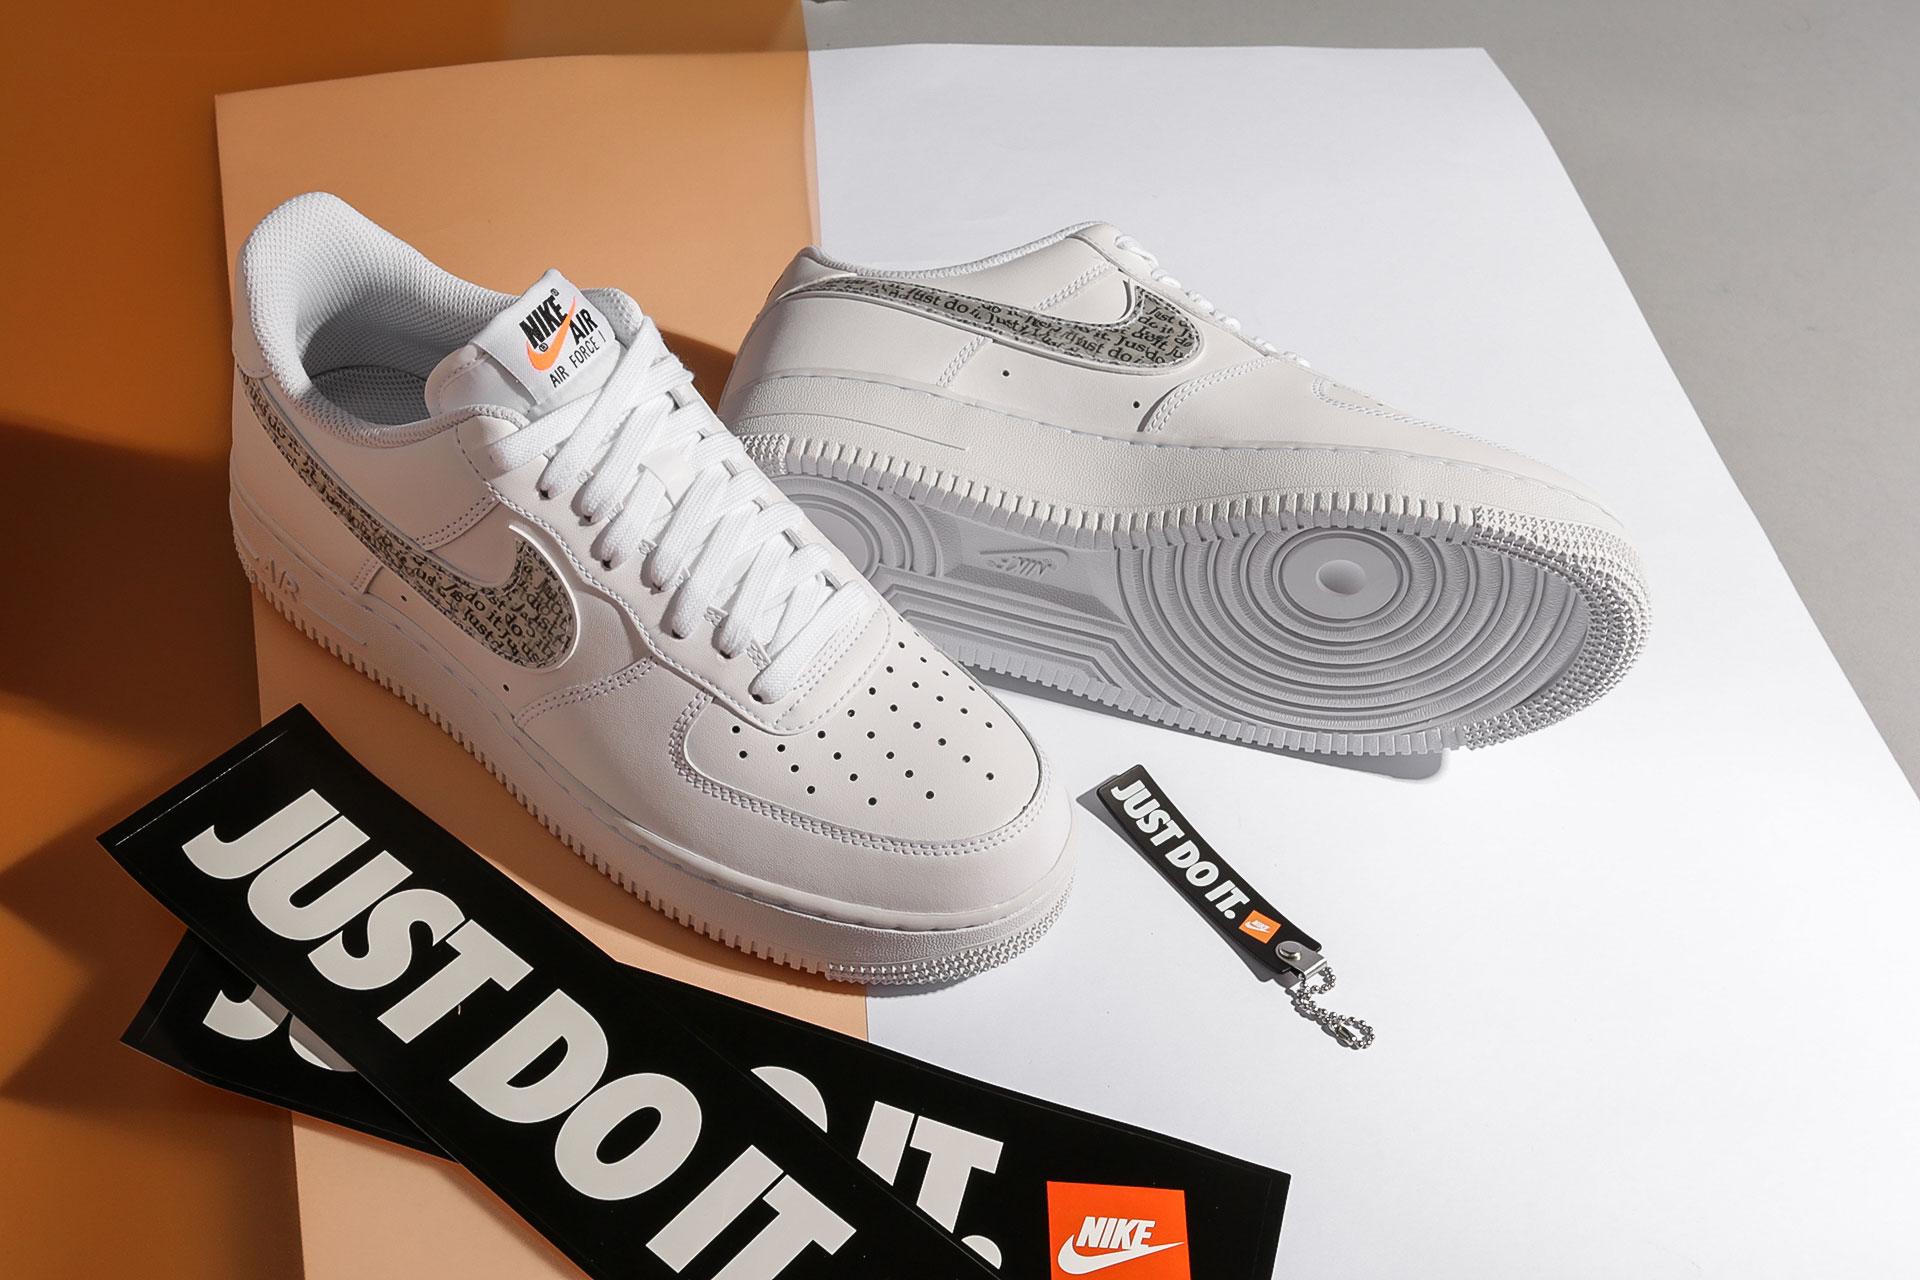 50377f37 ... Купить мужские белые кроссовки Nike Air Force 1 '07 LV8 JDI LNTC - фото  5